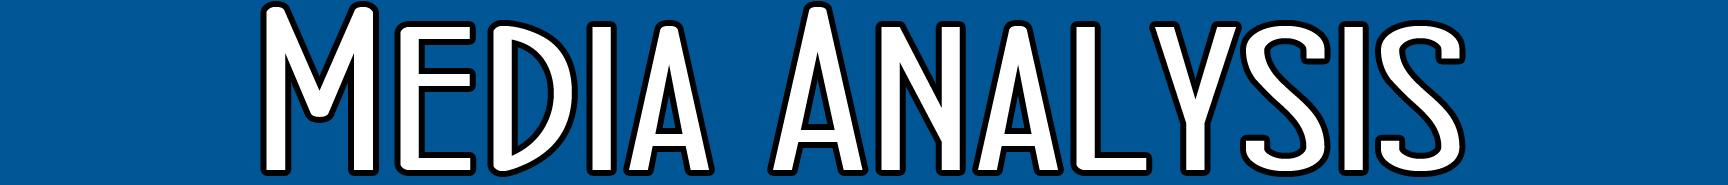 Media Analysis Title Banner